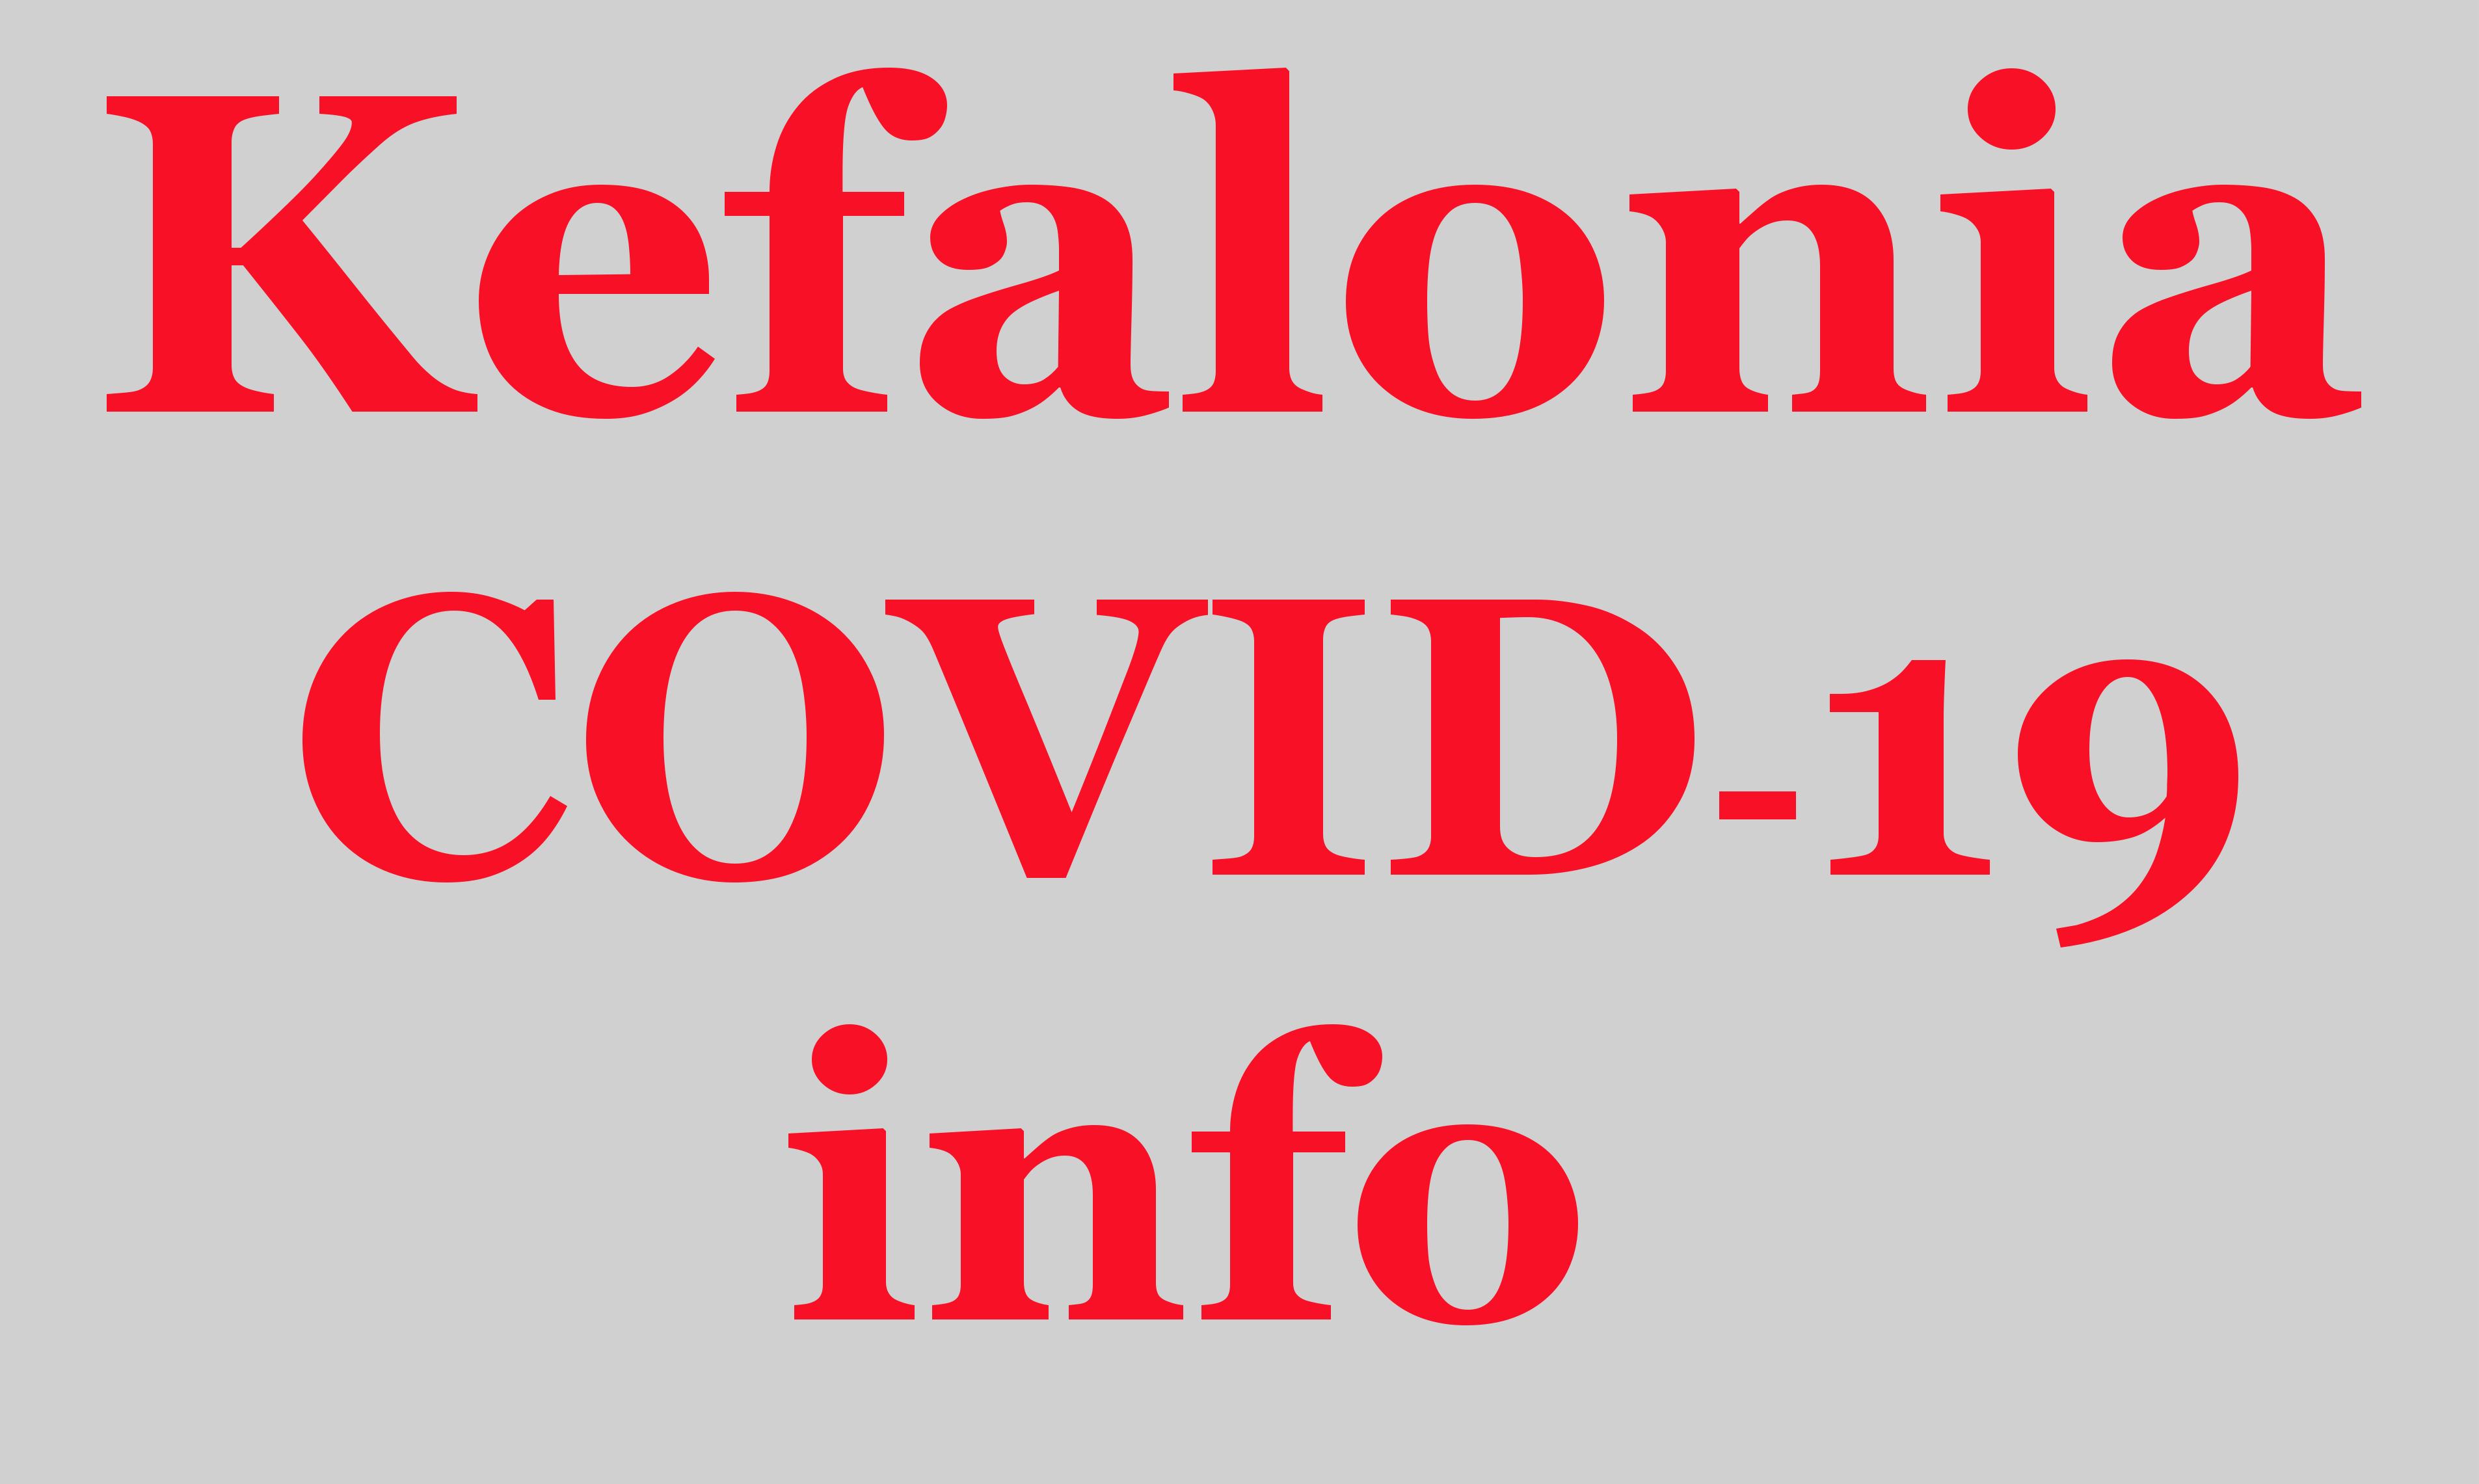 Инфо о коронавирусе на Кефалонии